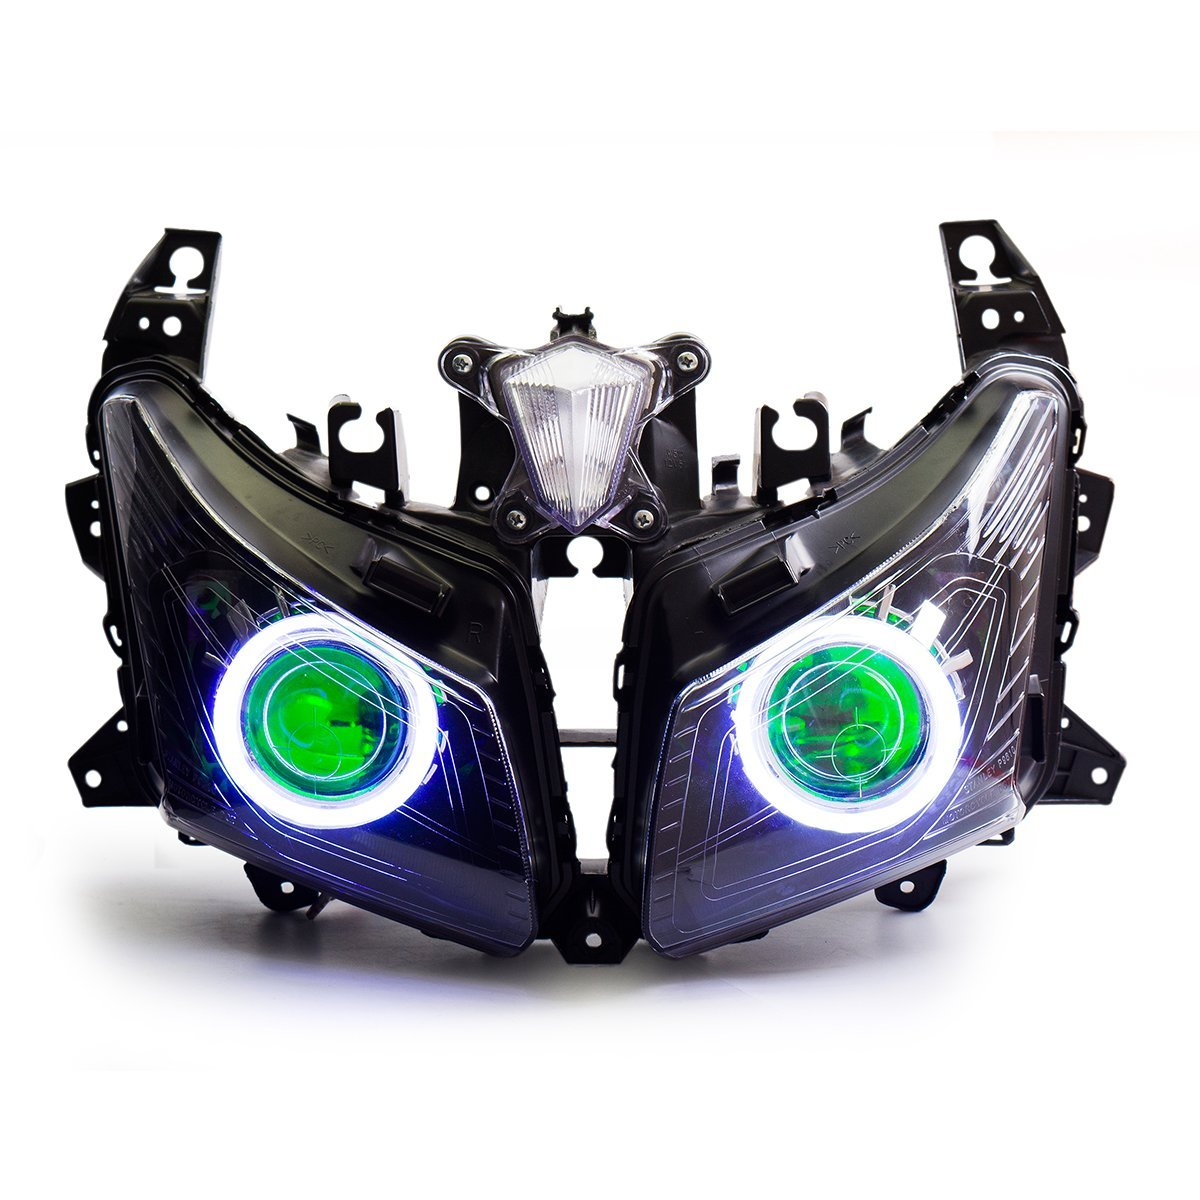 KT LED Angel Eye Headlight Assembly for Yamaha T-Max 530 2012-2014 Green Demon Eye